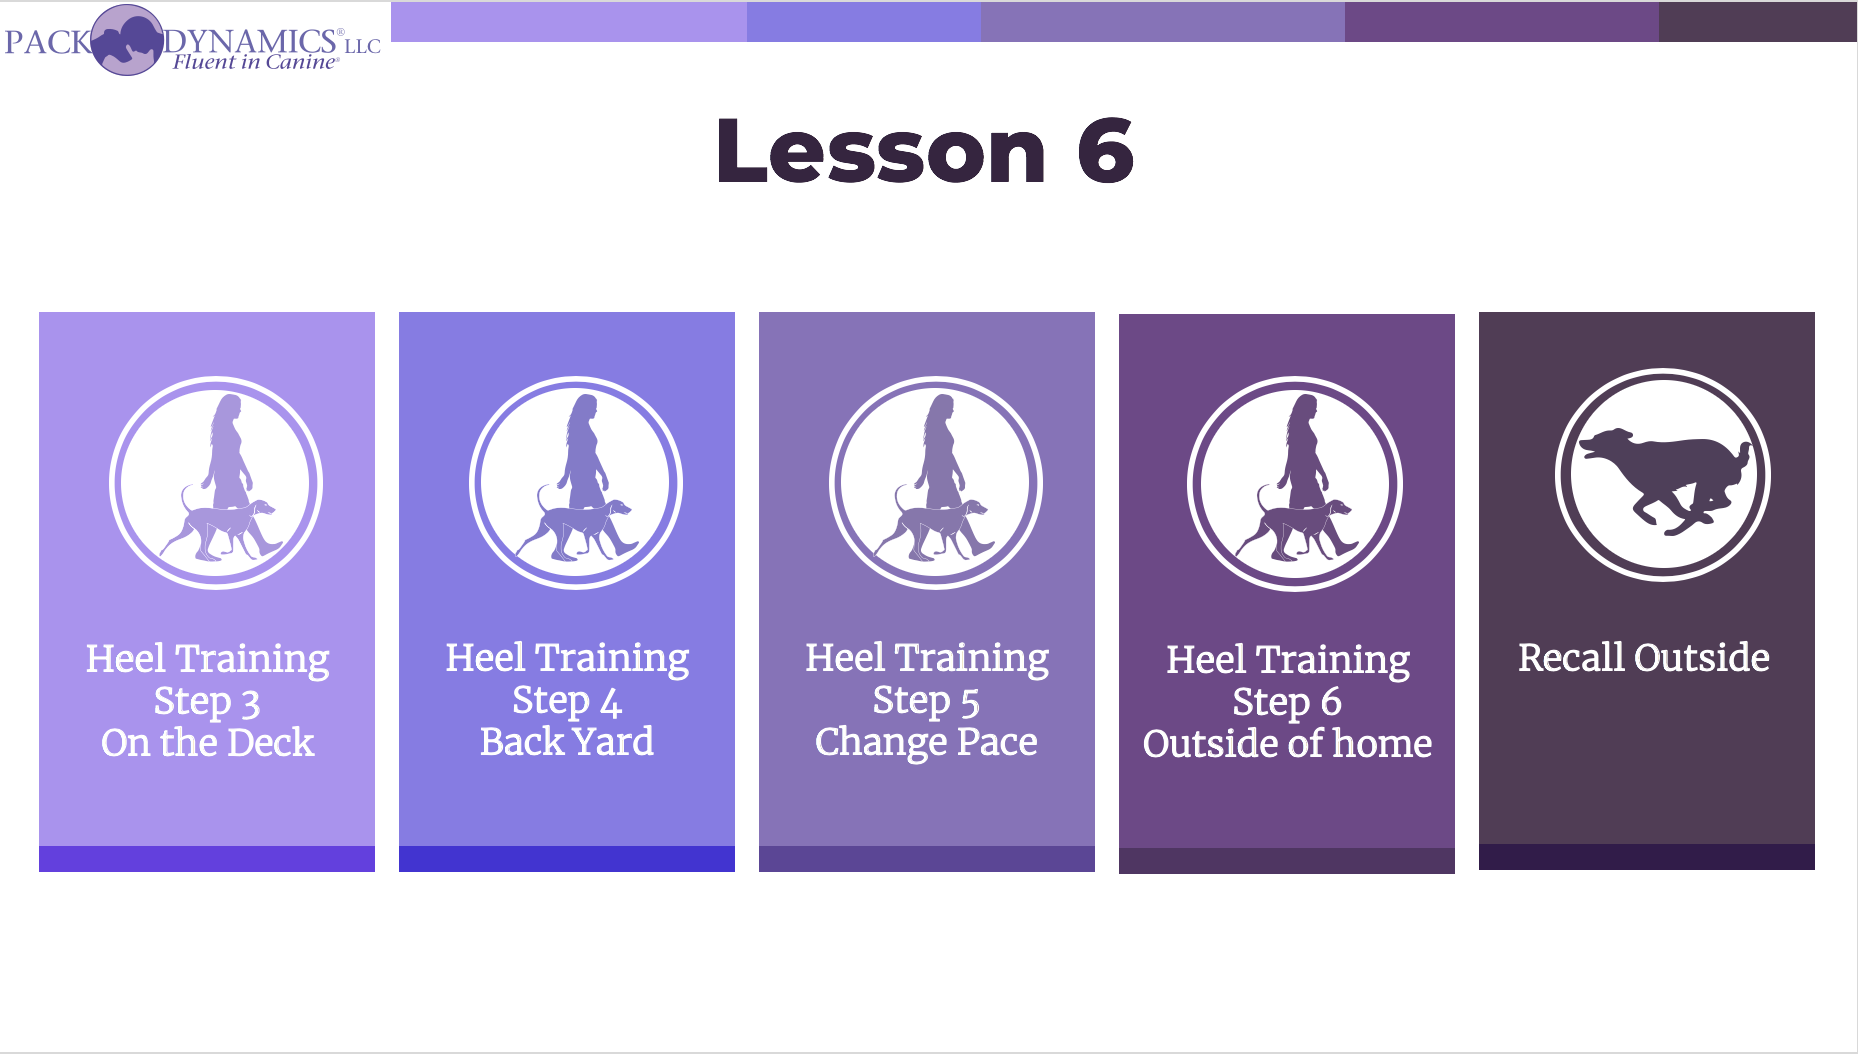 Pack Dynamics - Online Course - Lesson 6